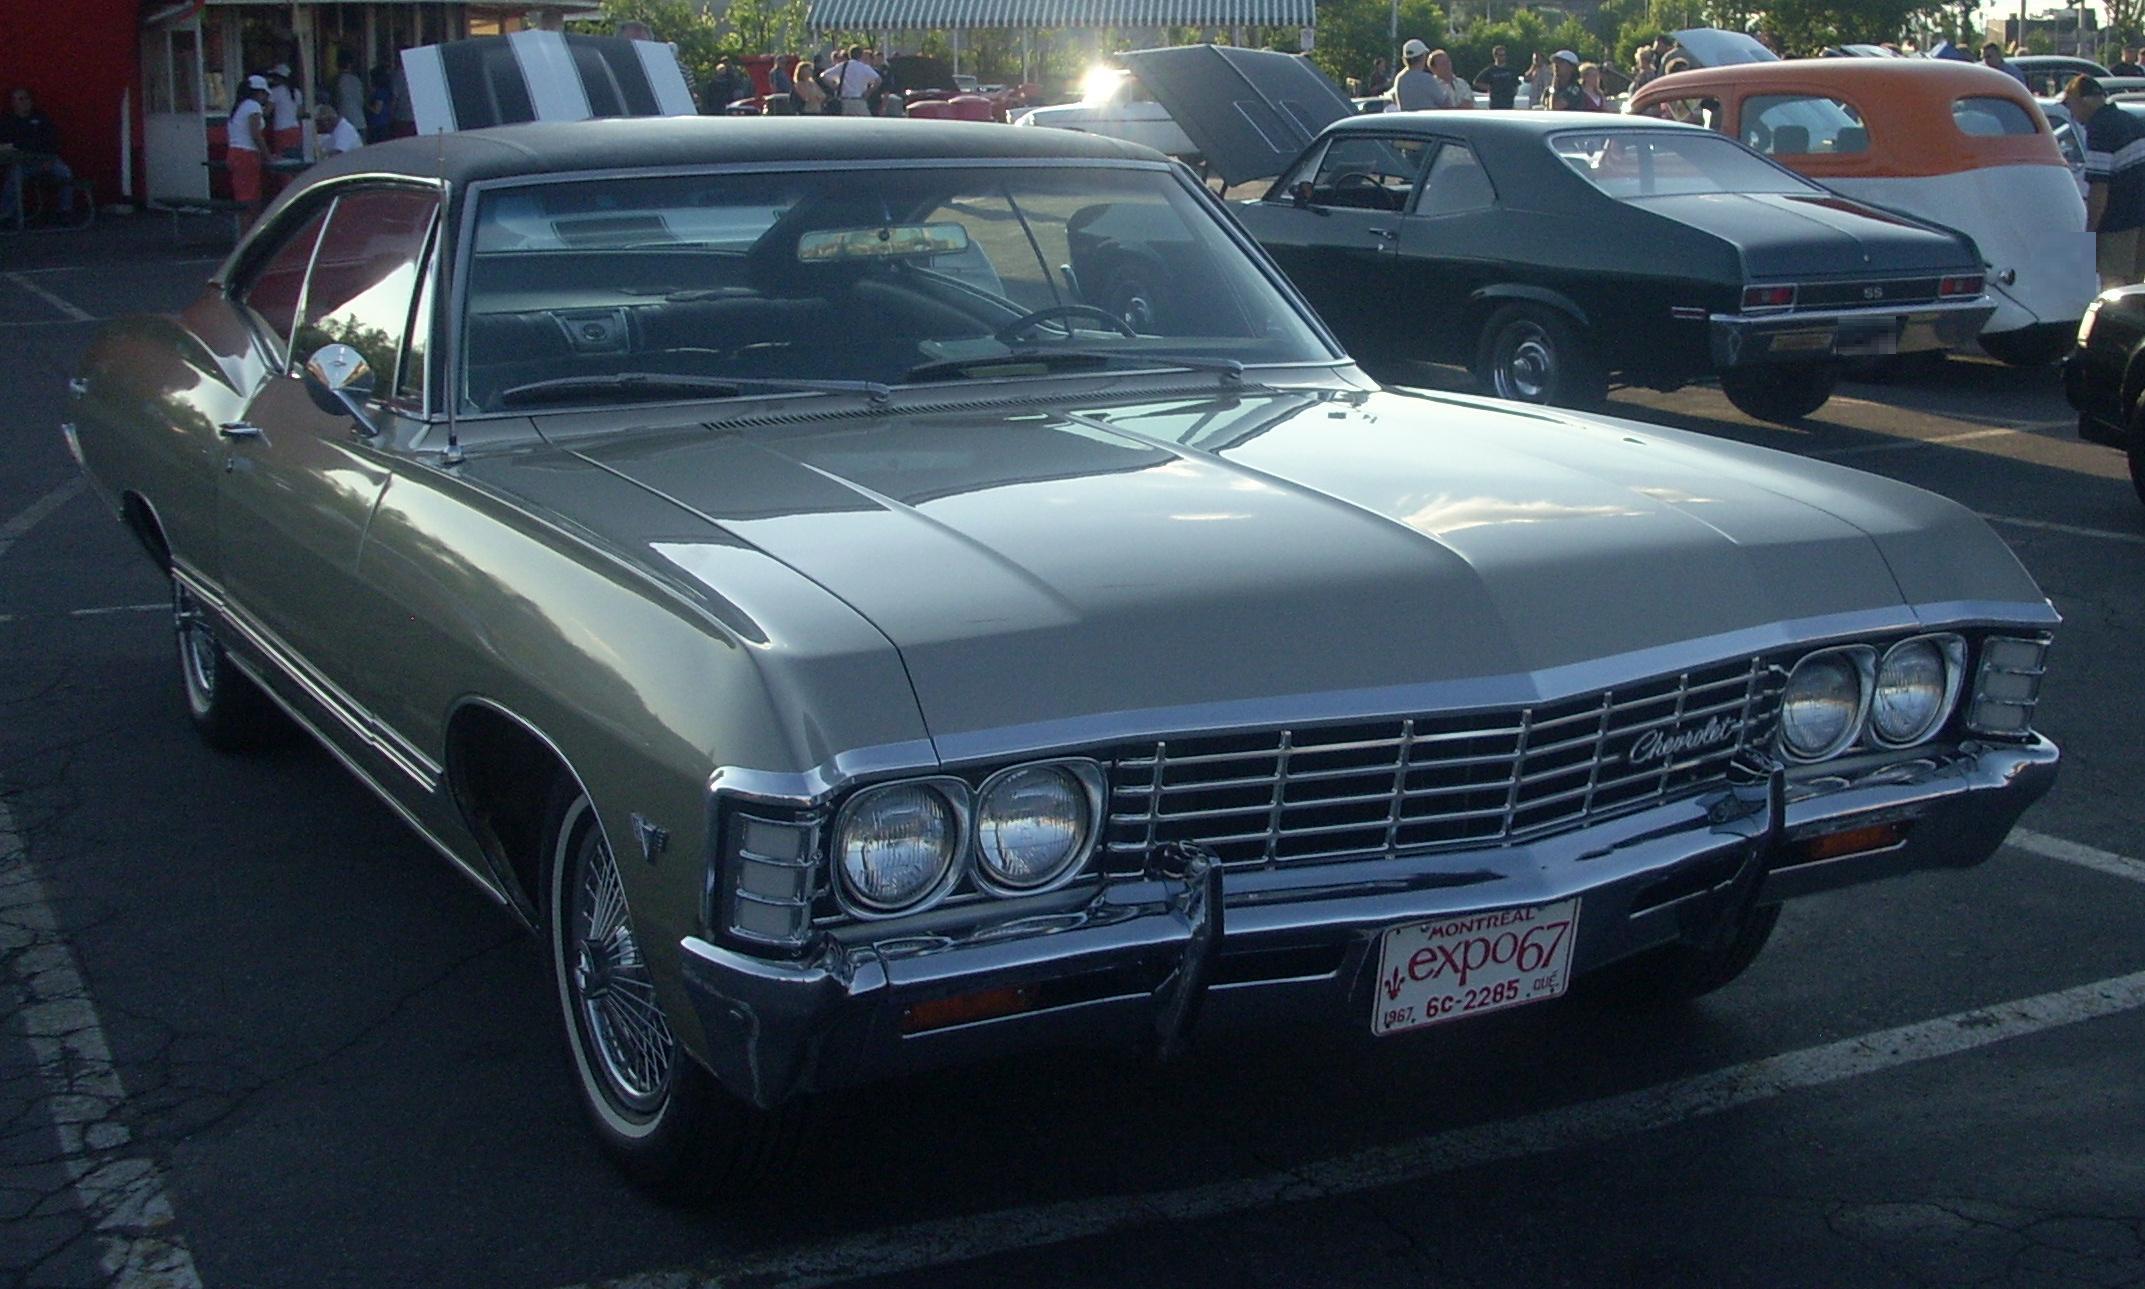 supernatural black 1967 chevy impala for sale autos post. Black Bedroom Furniture Sets. Home Design Ideas